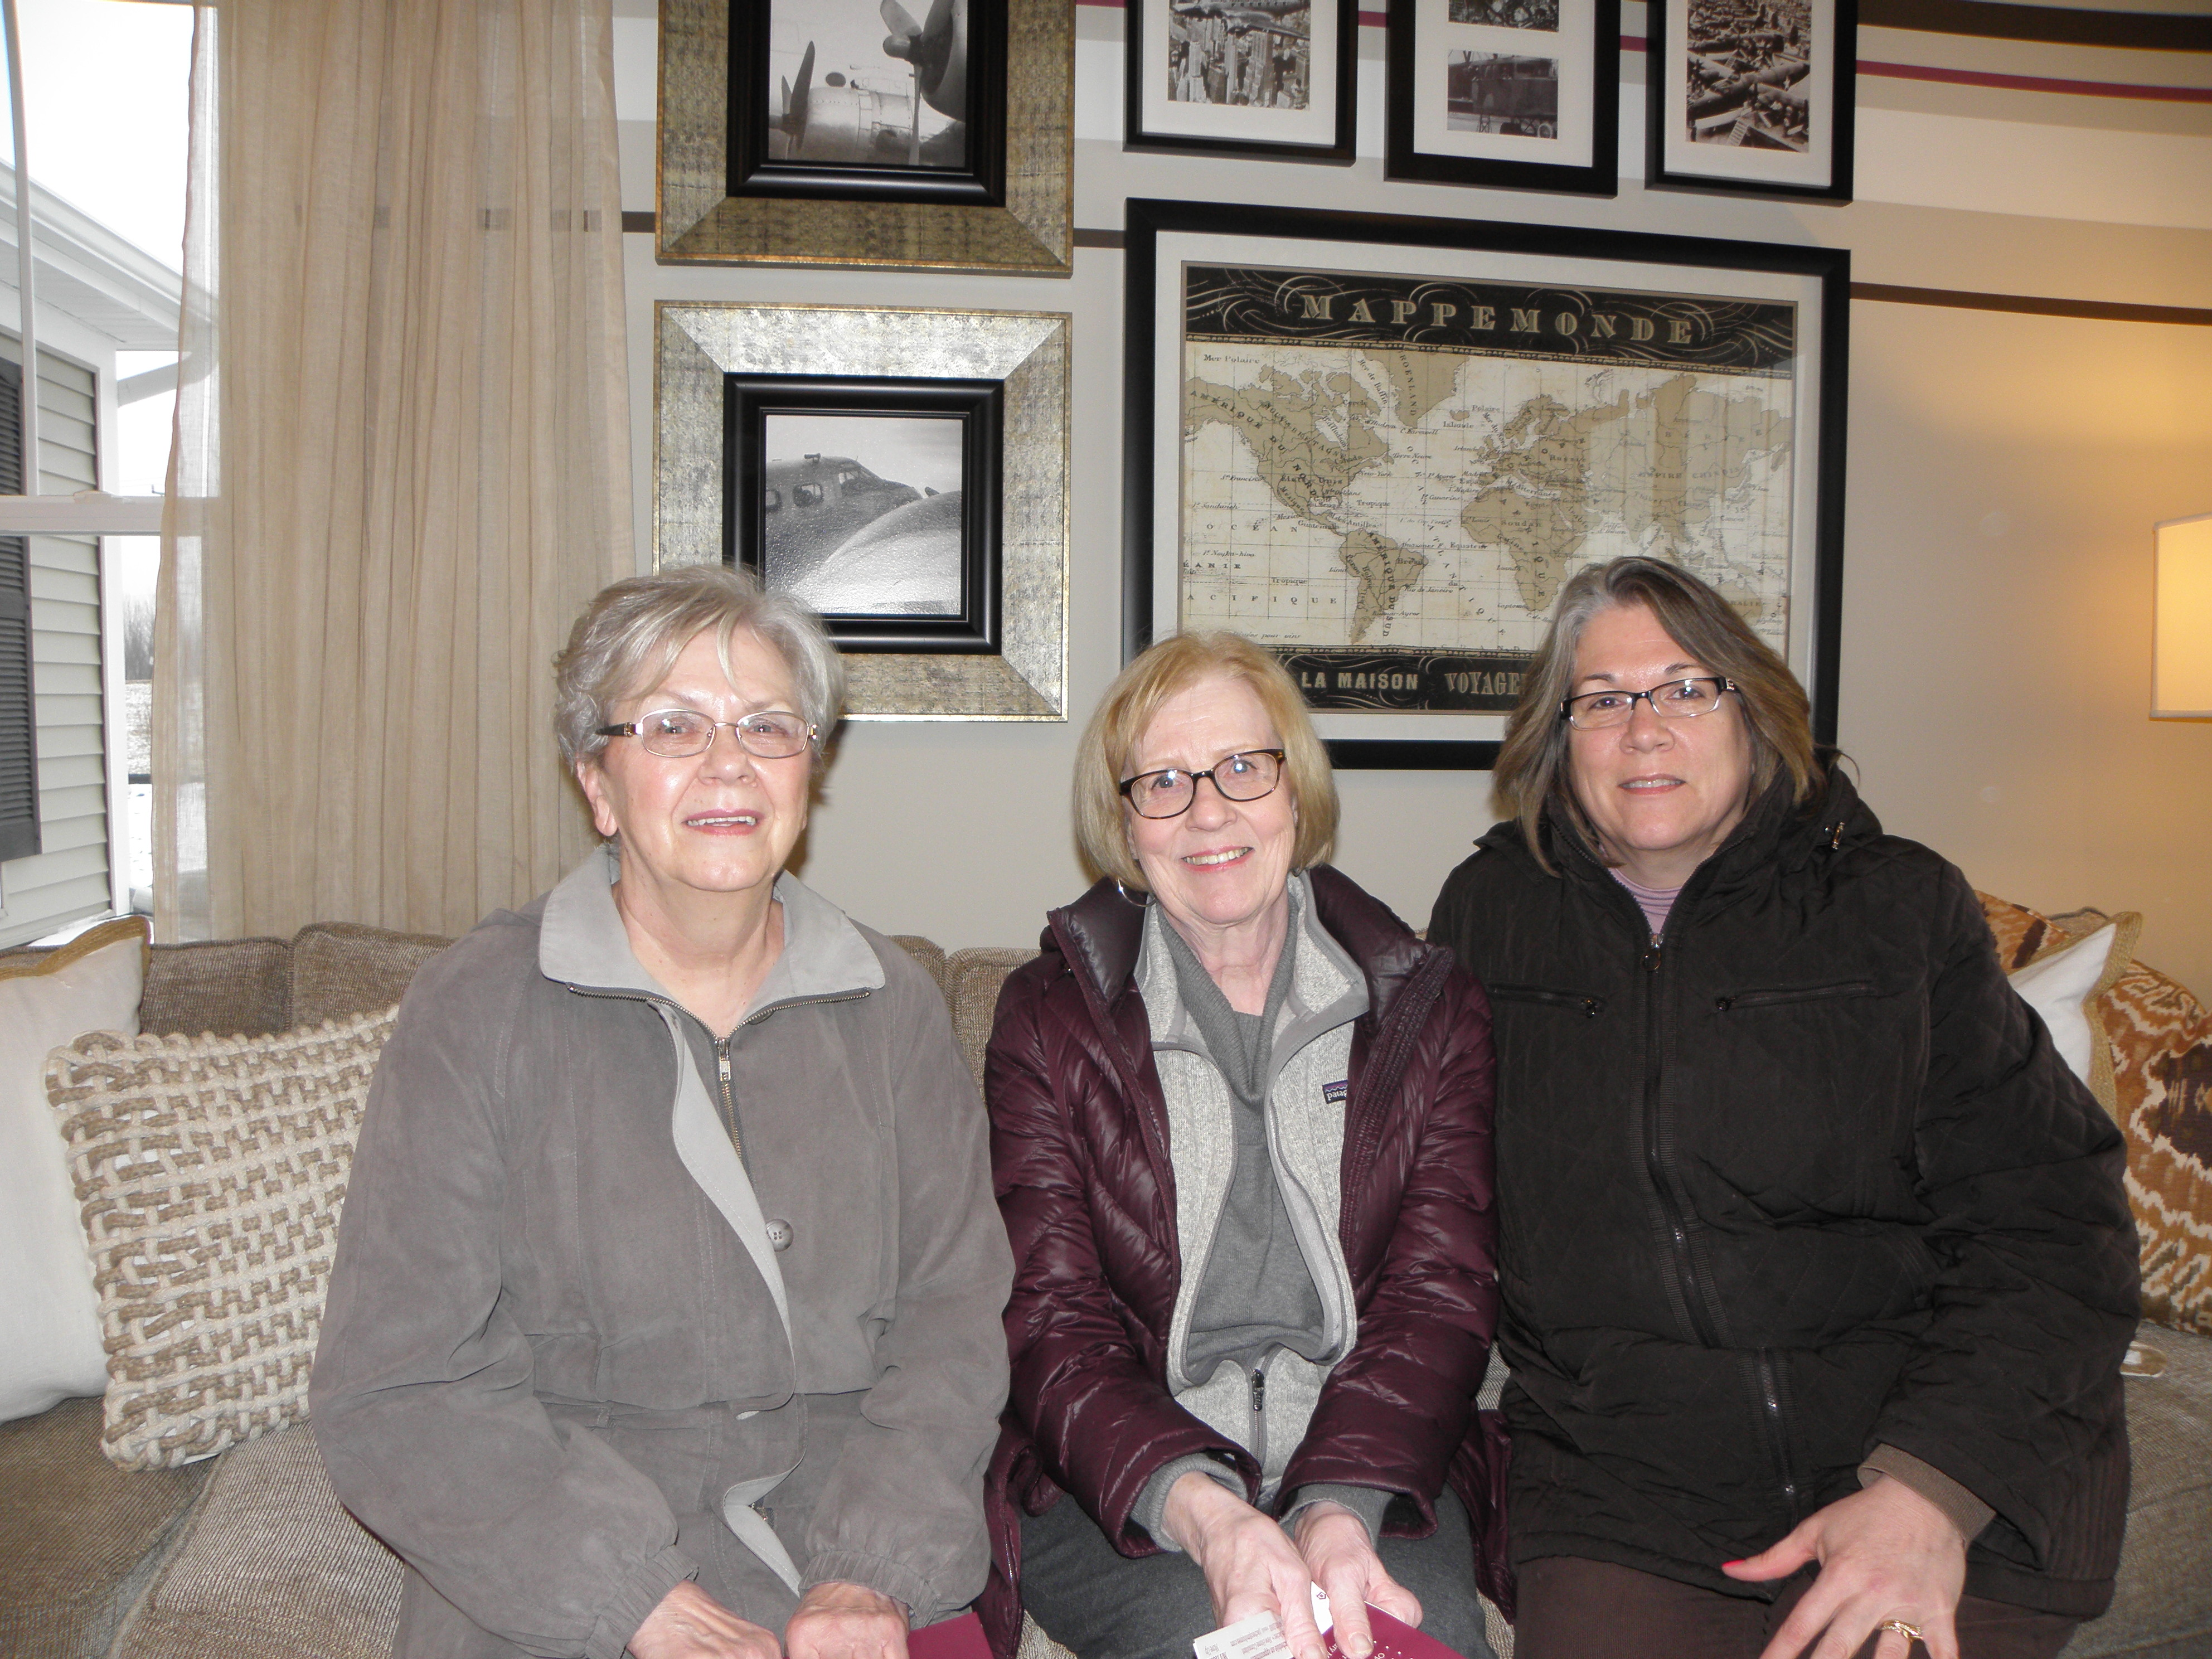 Pat-Kratochvil-Lois-Simmons-Debbie-Fill.jpg